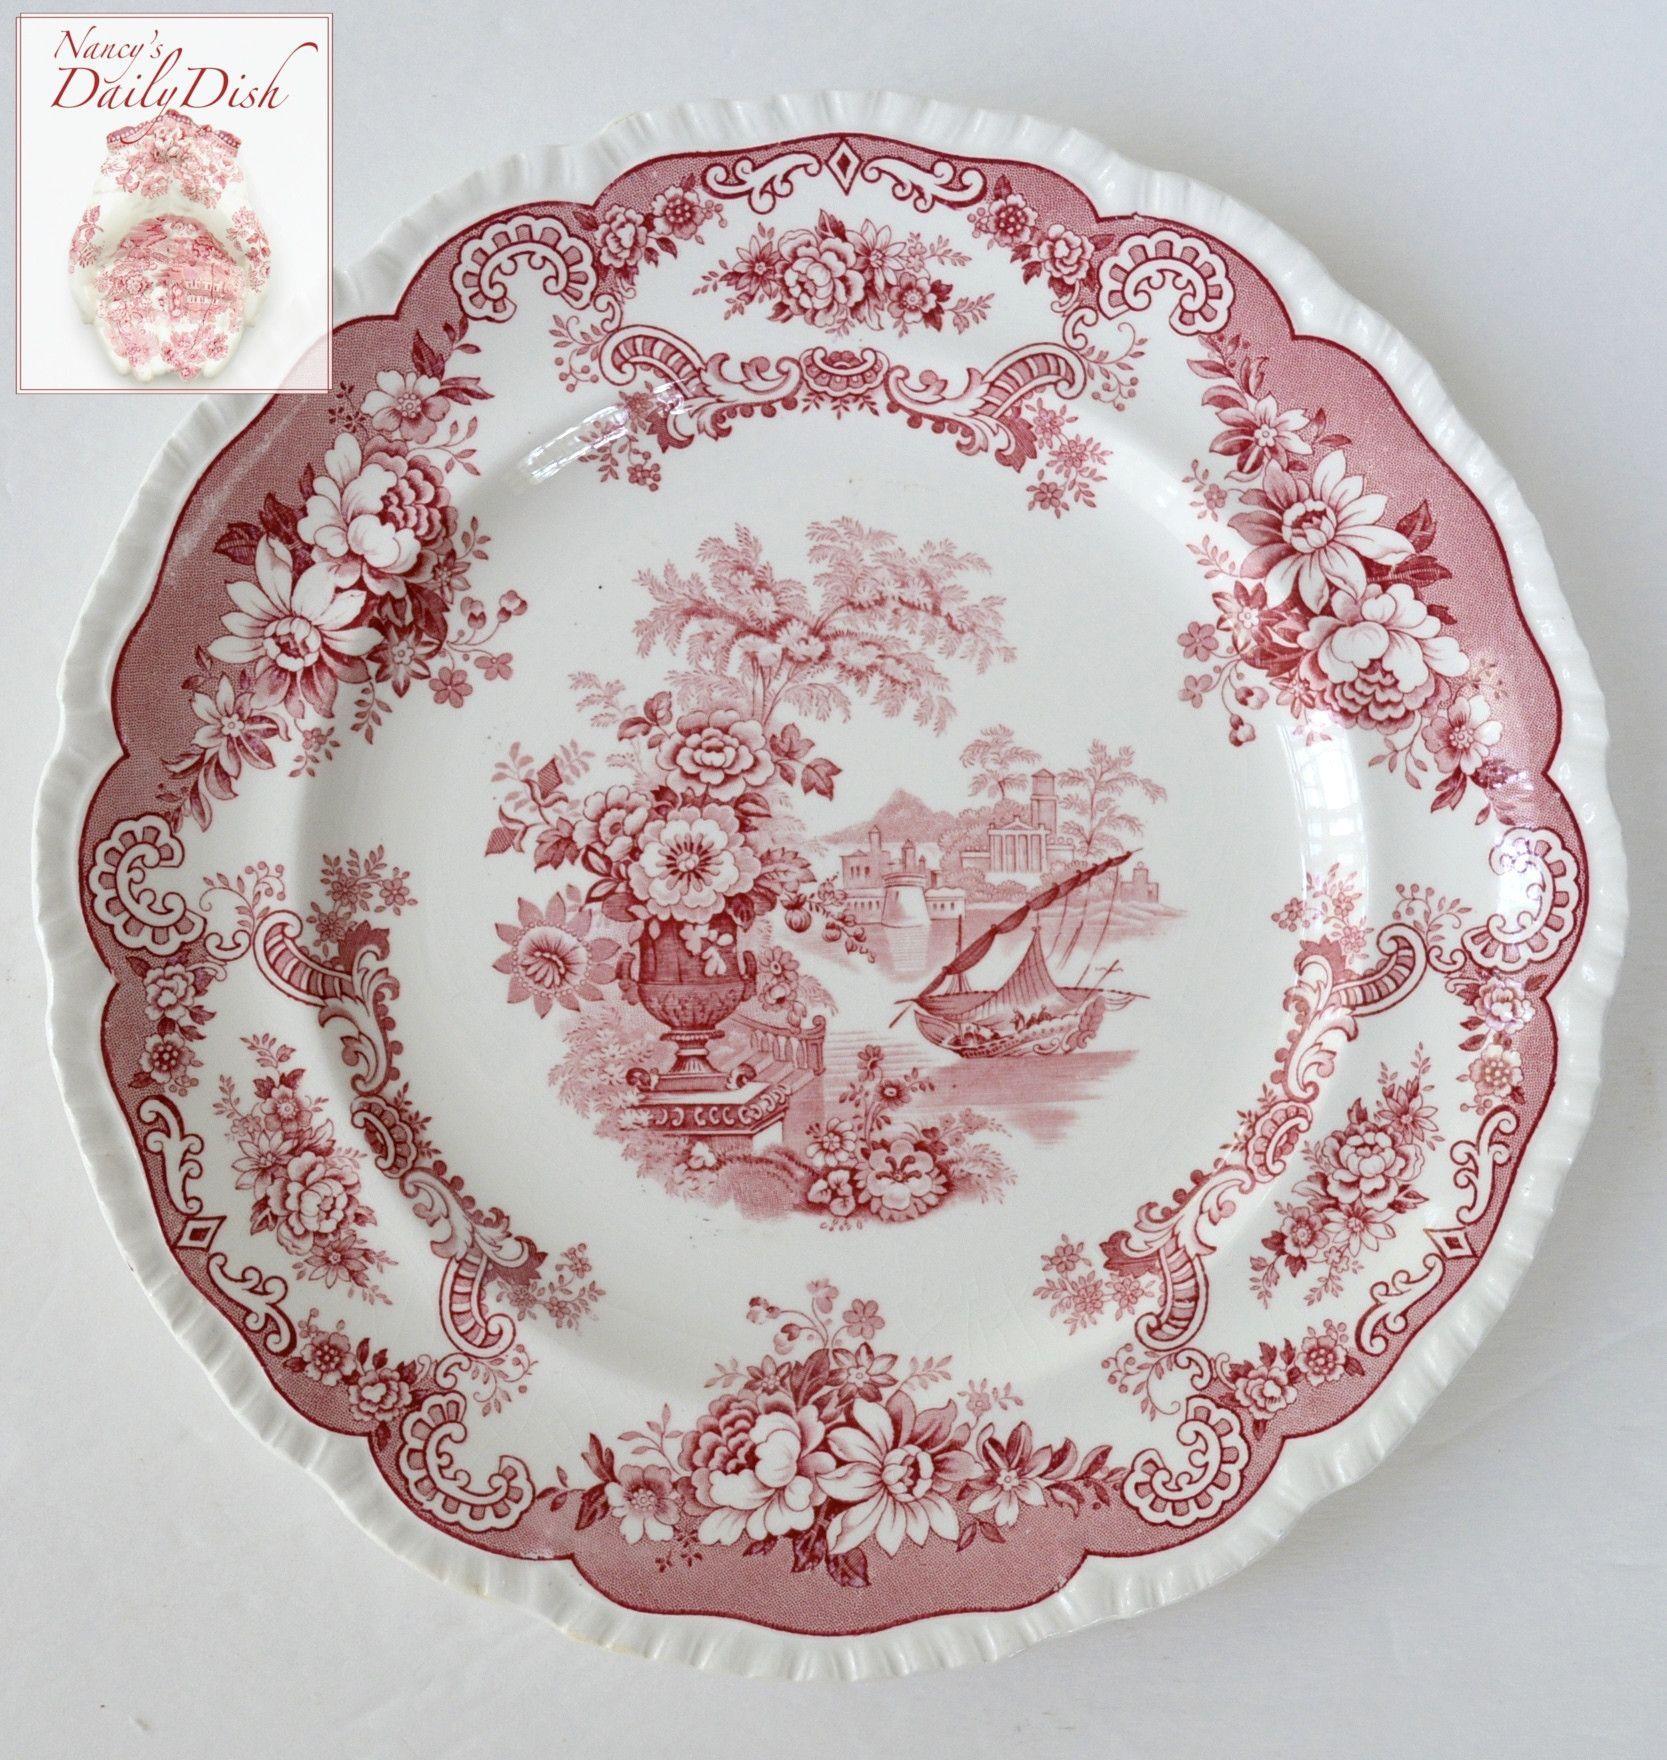 Fine Porcelain Transferware Plate Bird /& Floral Design Very Nice Display Piece